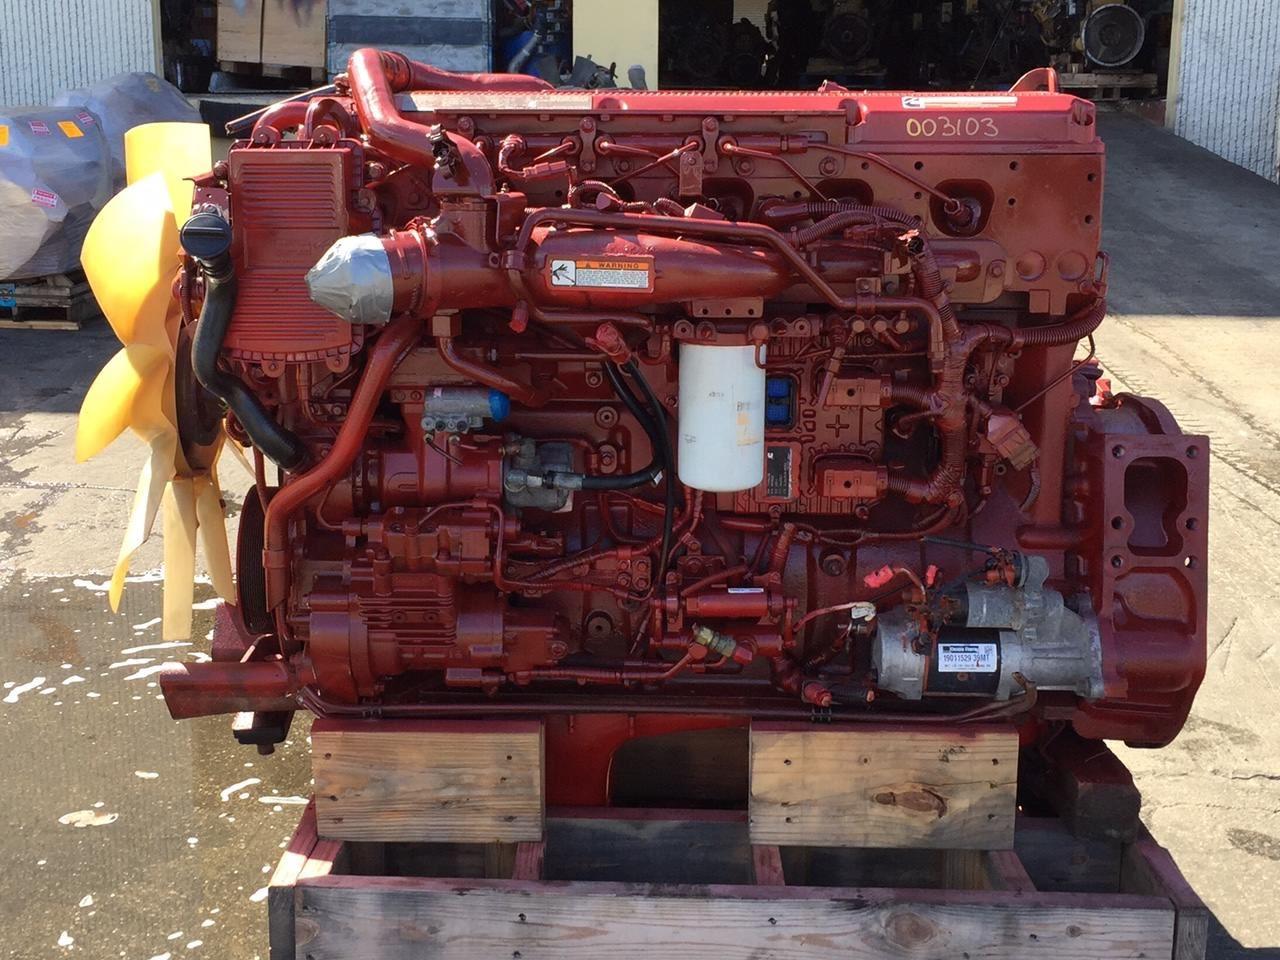 international truck fuel filter cummins isx15  stock 003103  engine assys tpi  cummins isx15  stock 003103  engine assys tpi